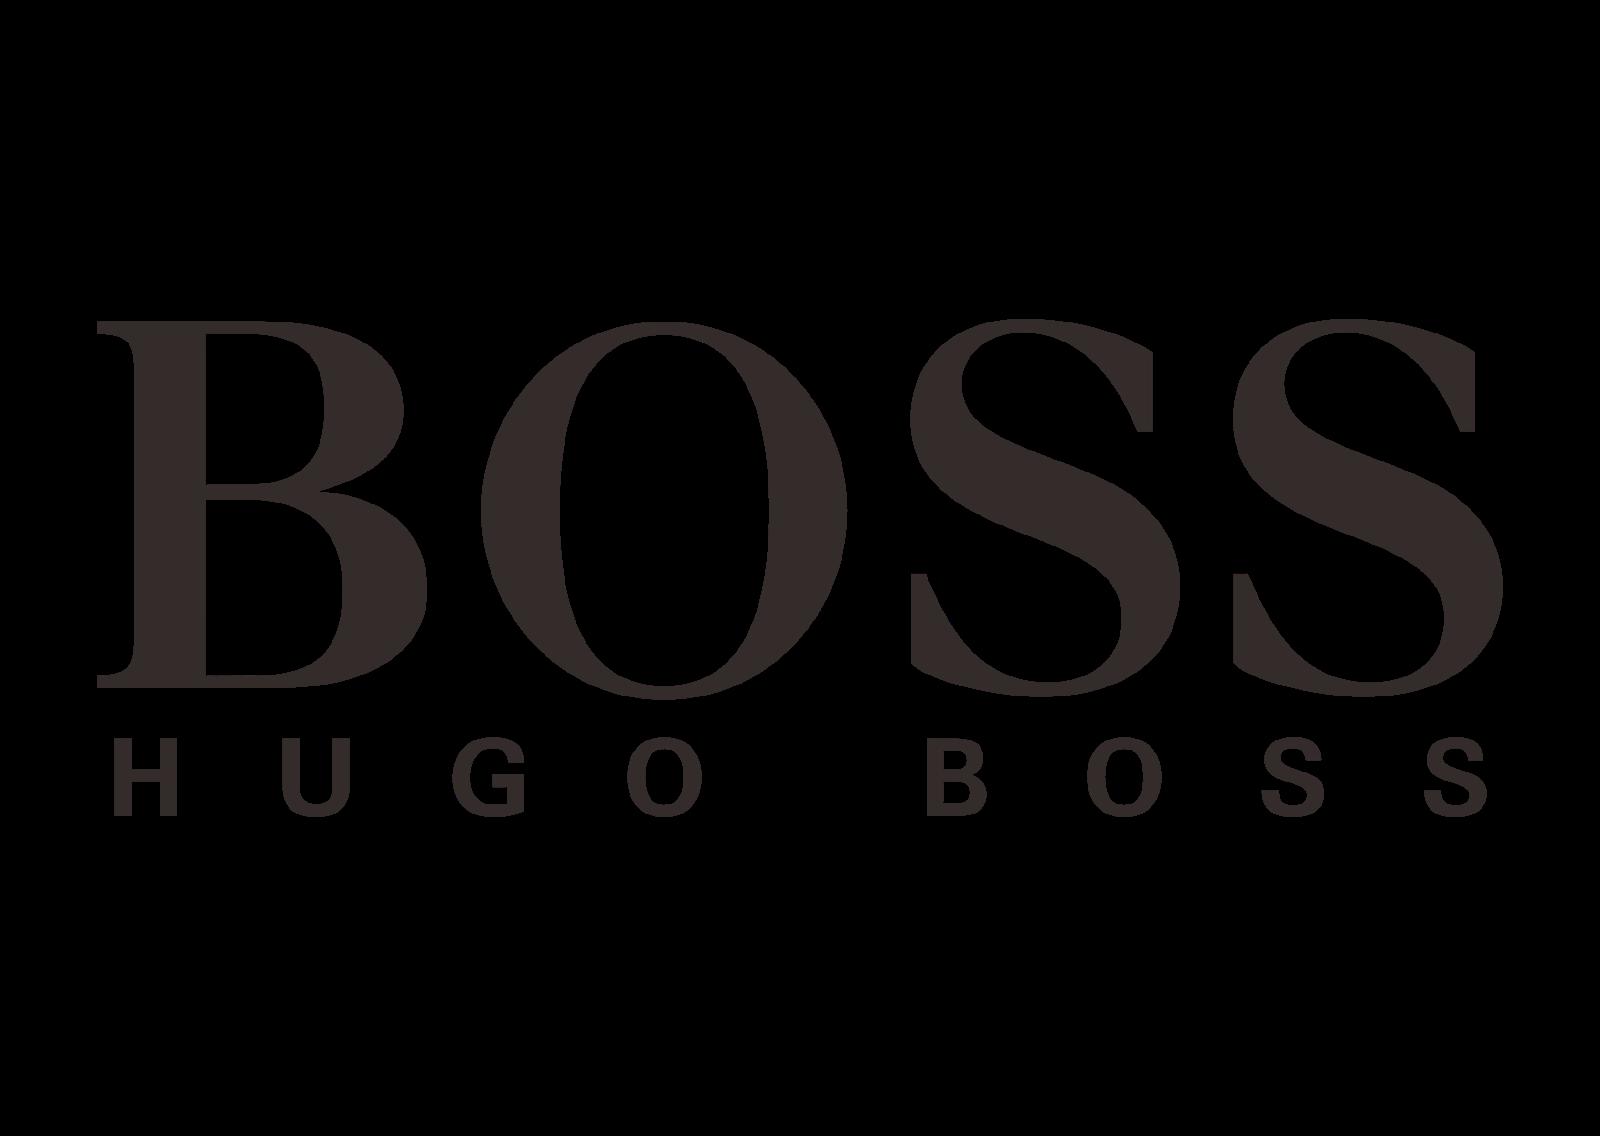 Hugo Boss (Германия)